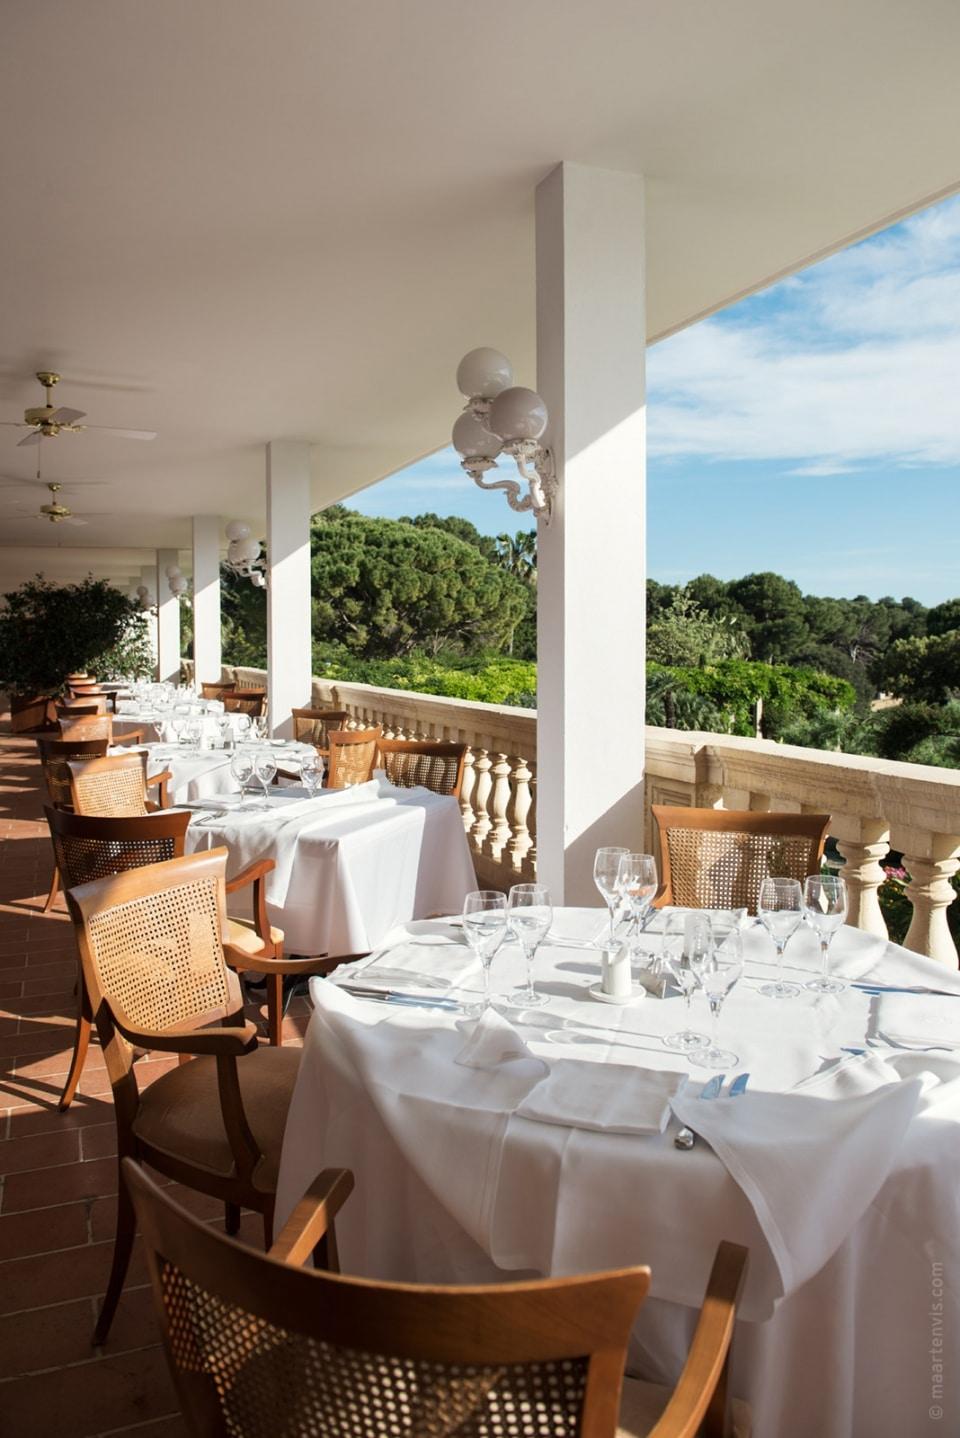 20140429 9566 960x1438 - Hotel Formentor in Spring